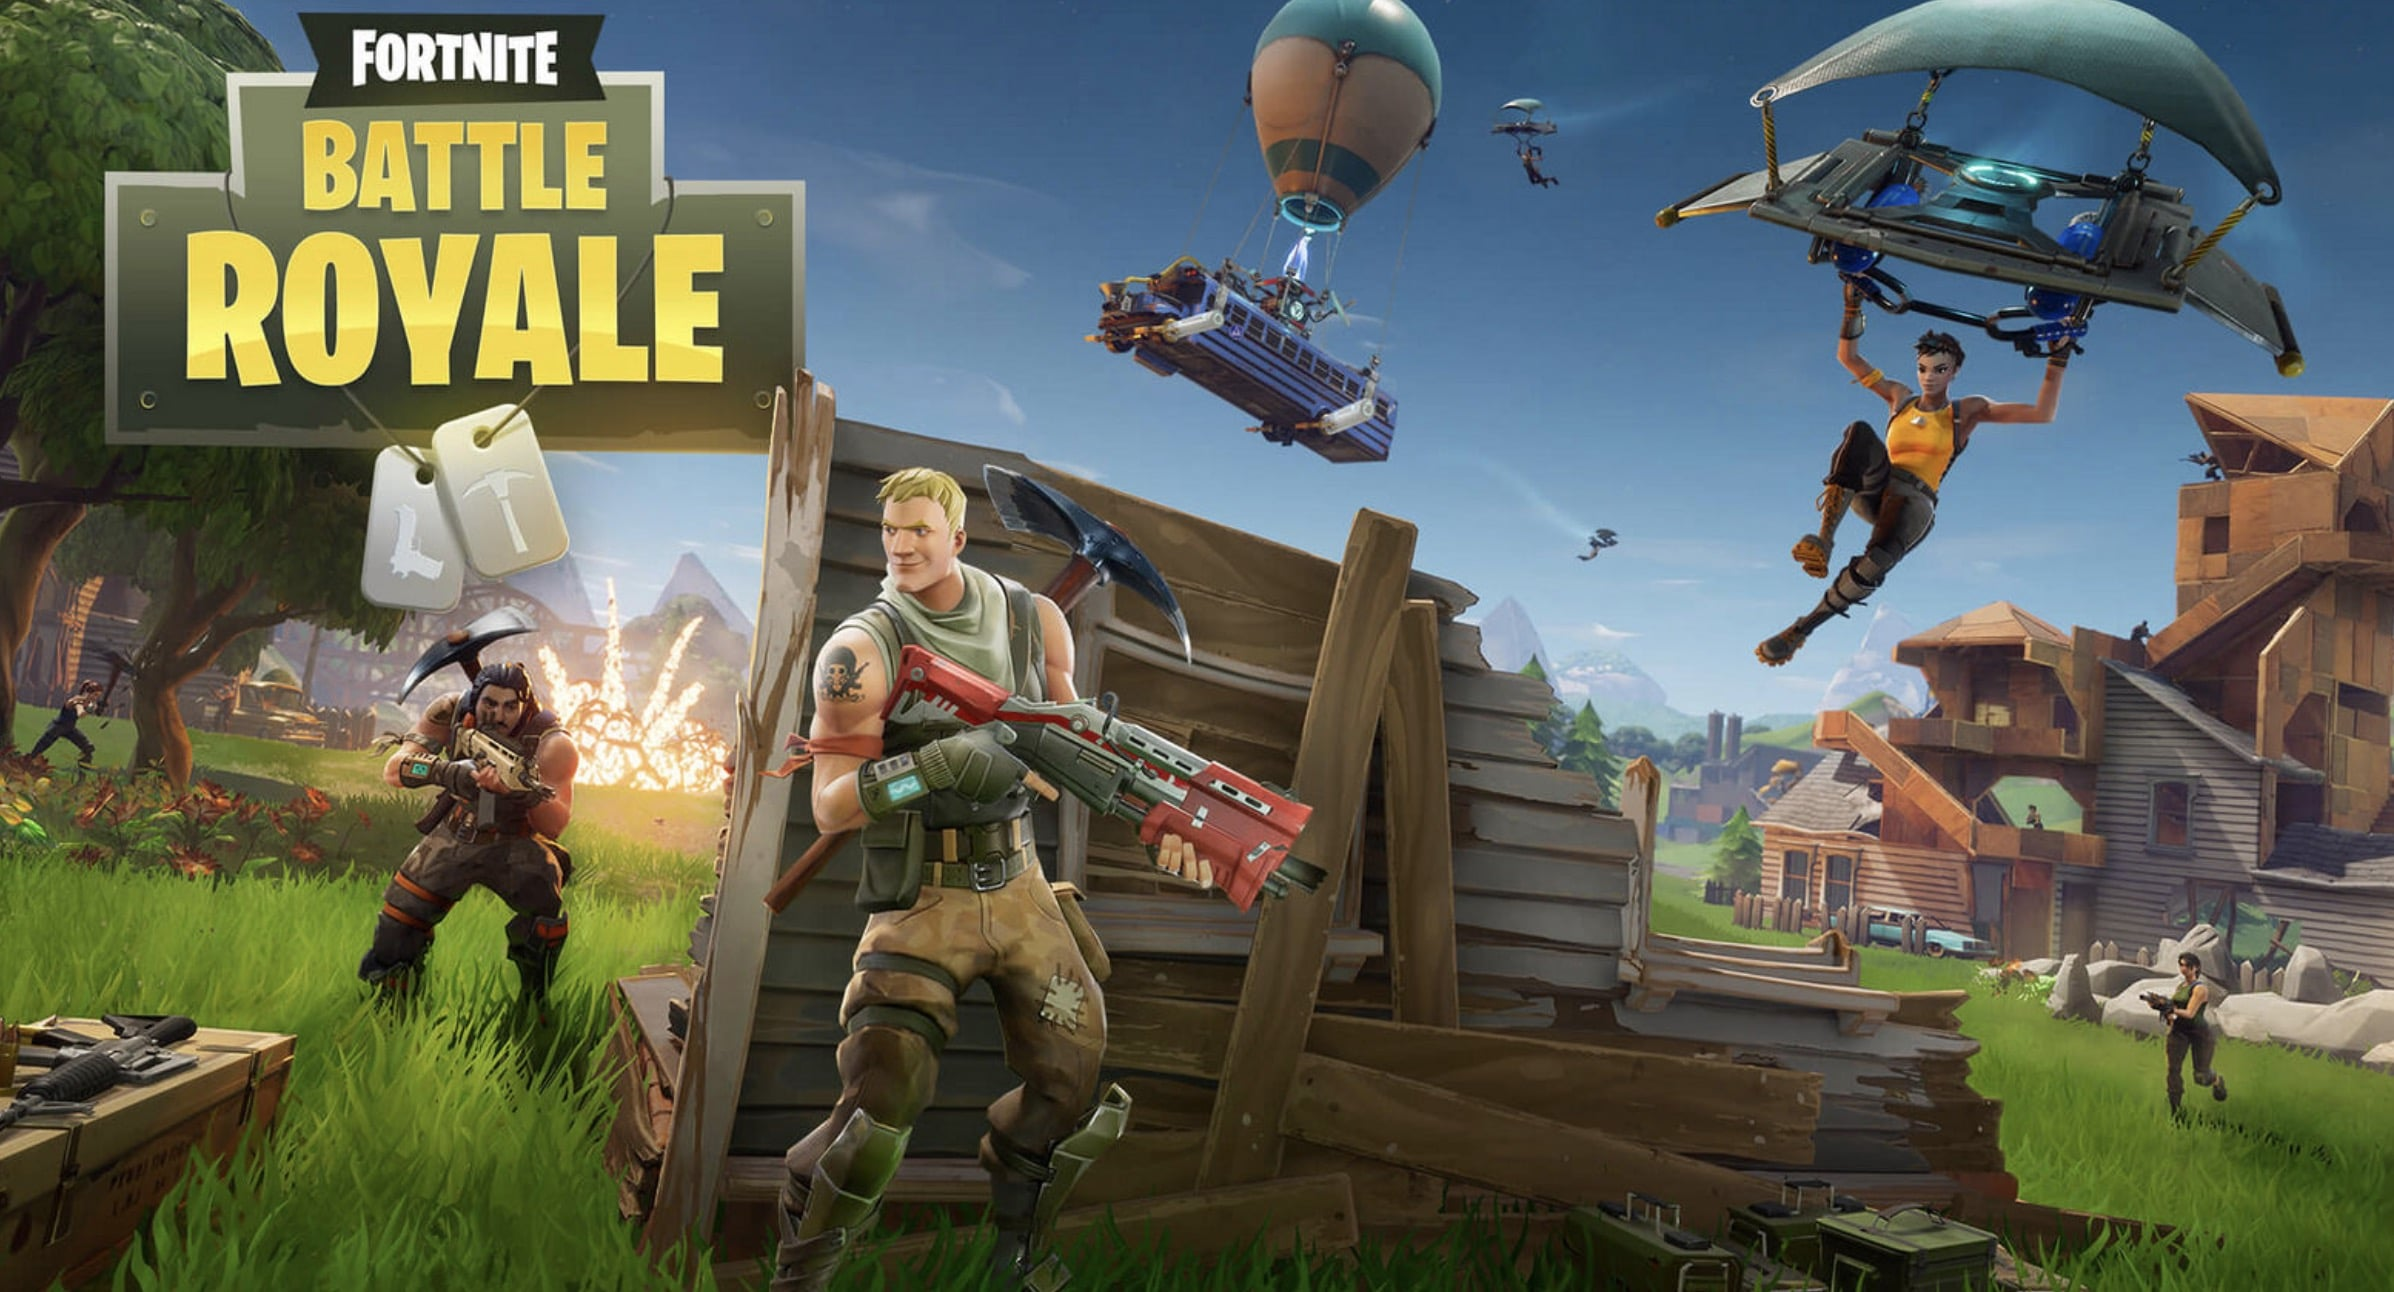 Fortnite en mode Battle Royale